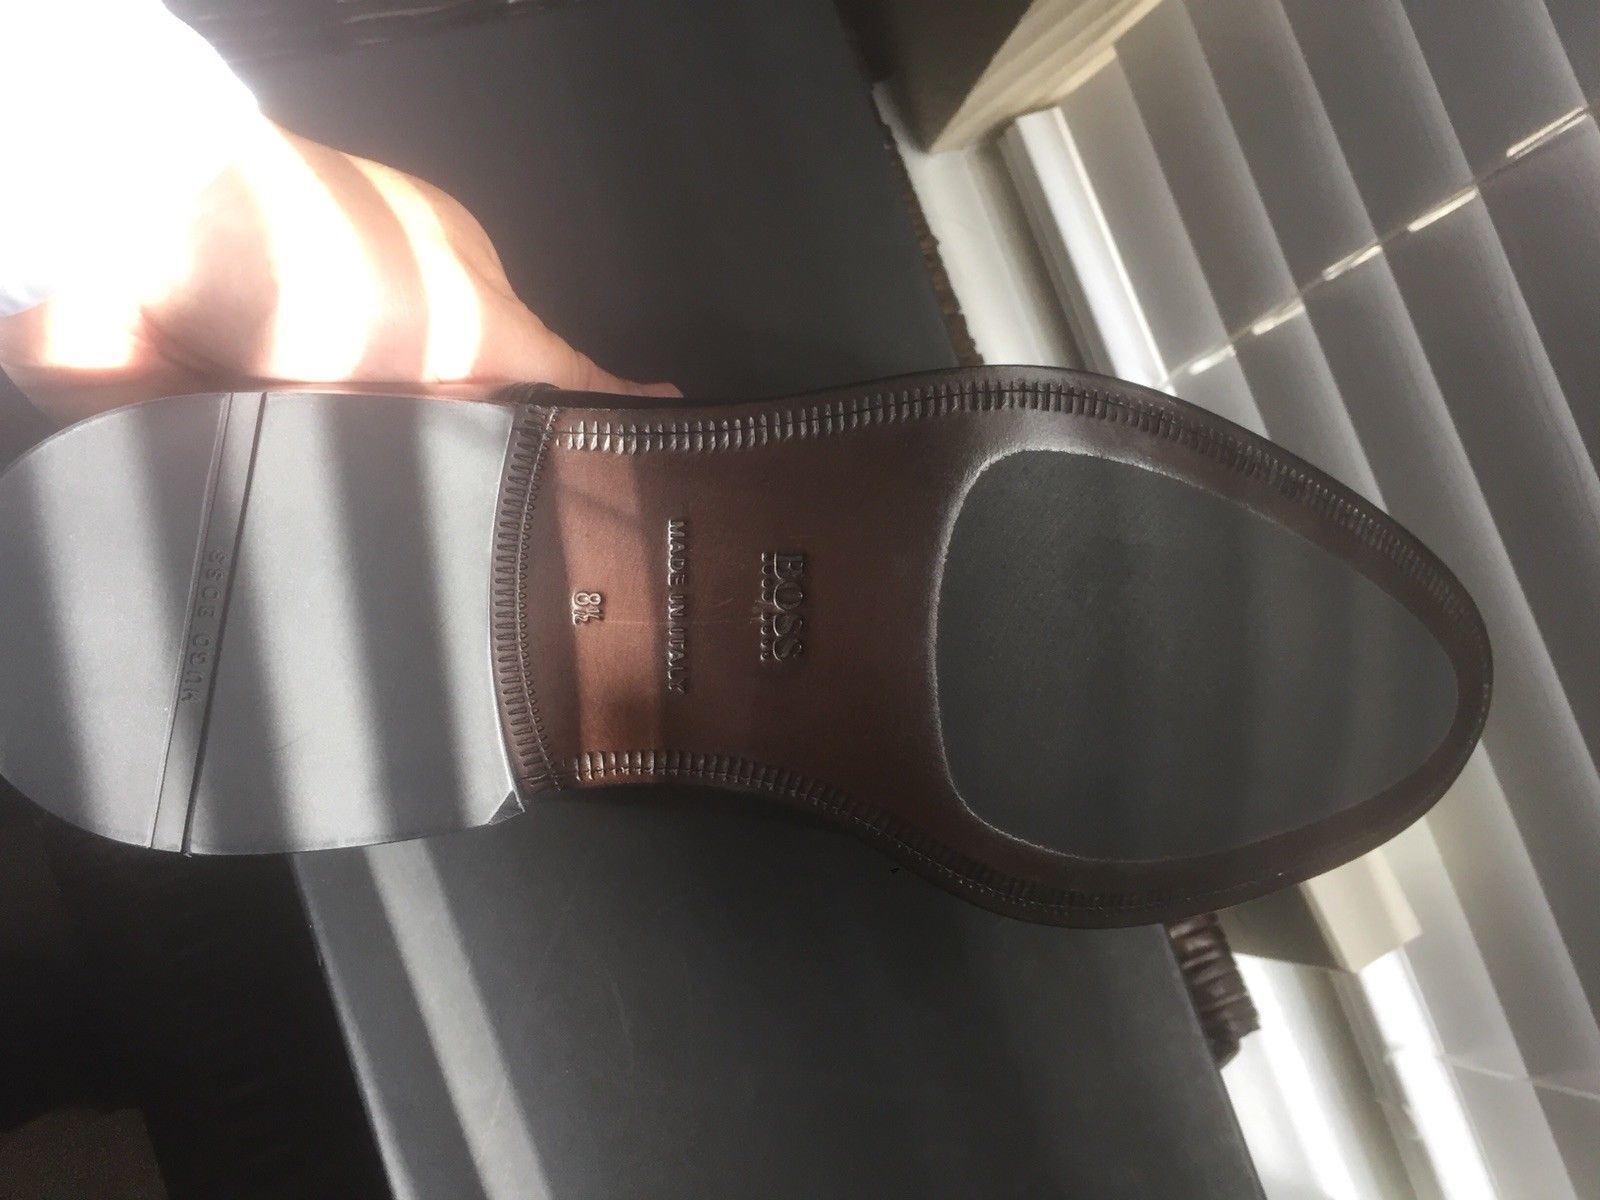 Hugo boss Uomo shoes shoes shoes size 10 f85dbd